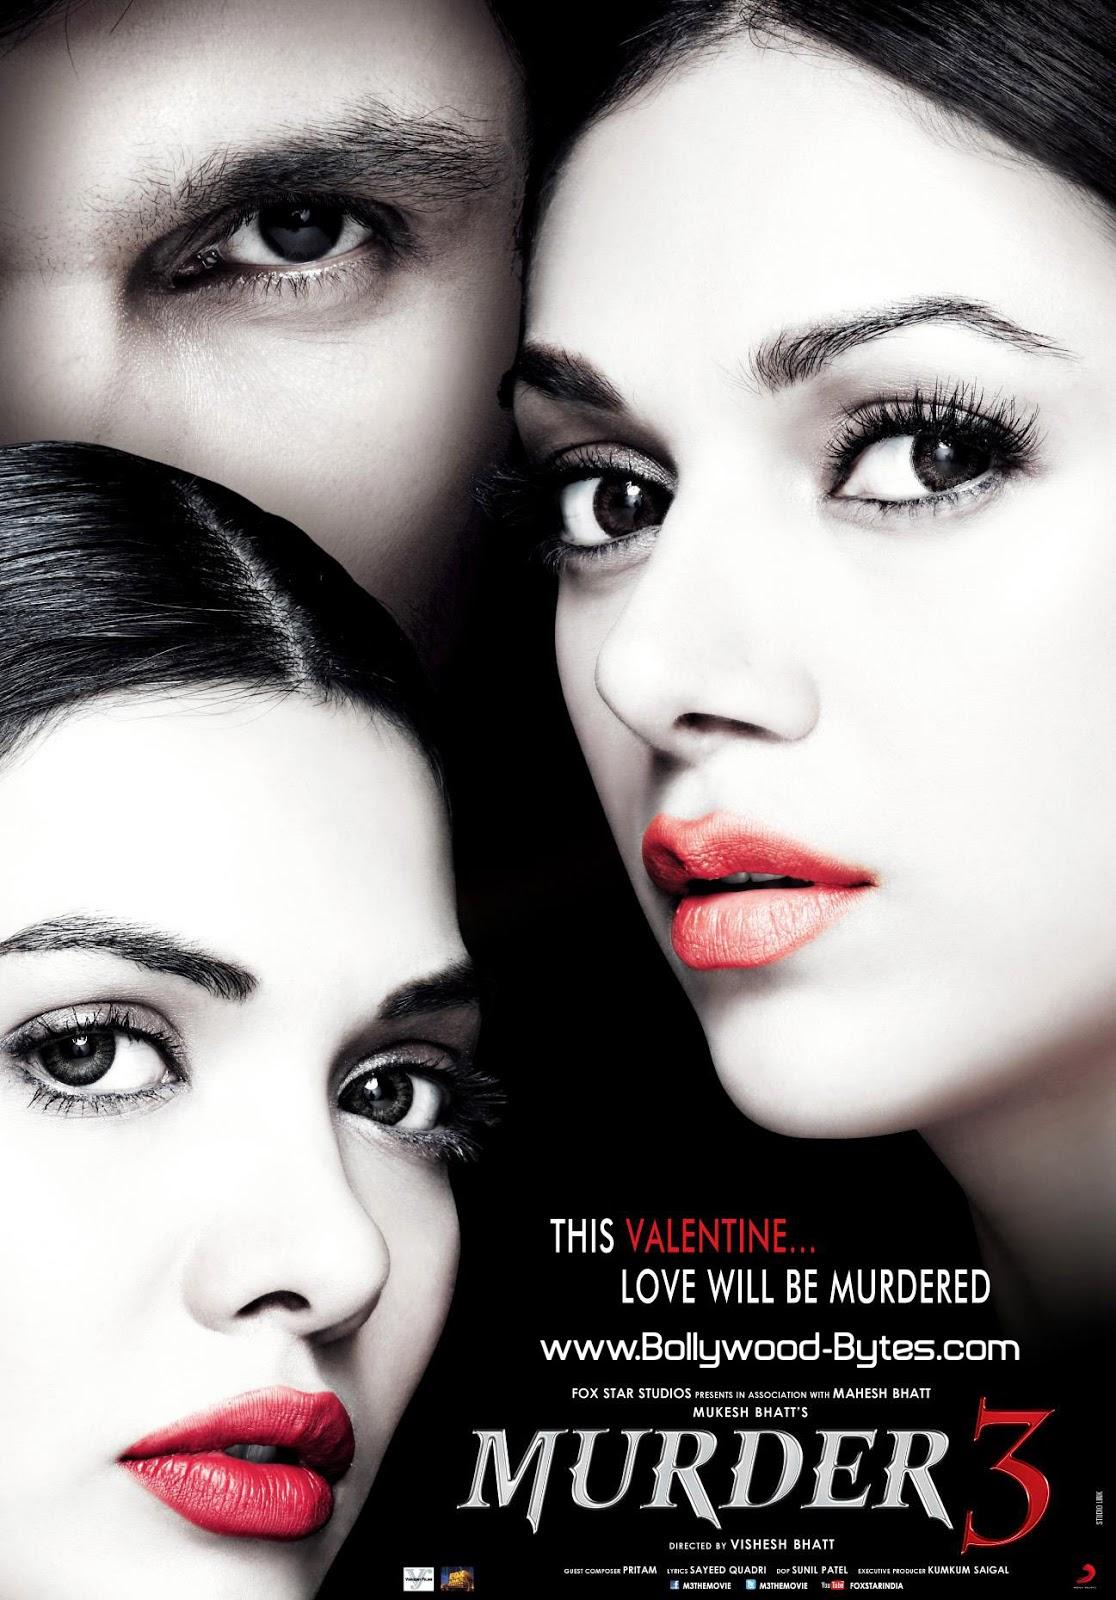 http://3.bp.blogspot.com/-6N8d2AQKZ1M/UOwdLgRF25I/AAAAAAAABv4/v6_sFeb1Cr0/s1600/Murder-3+poster.jpg